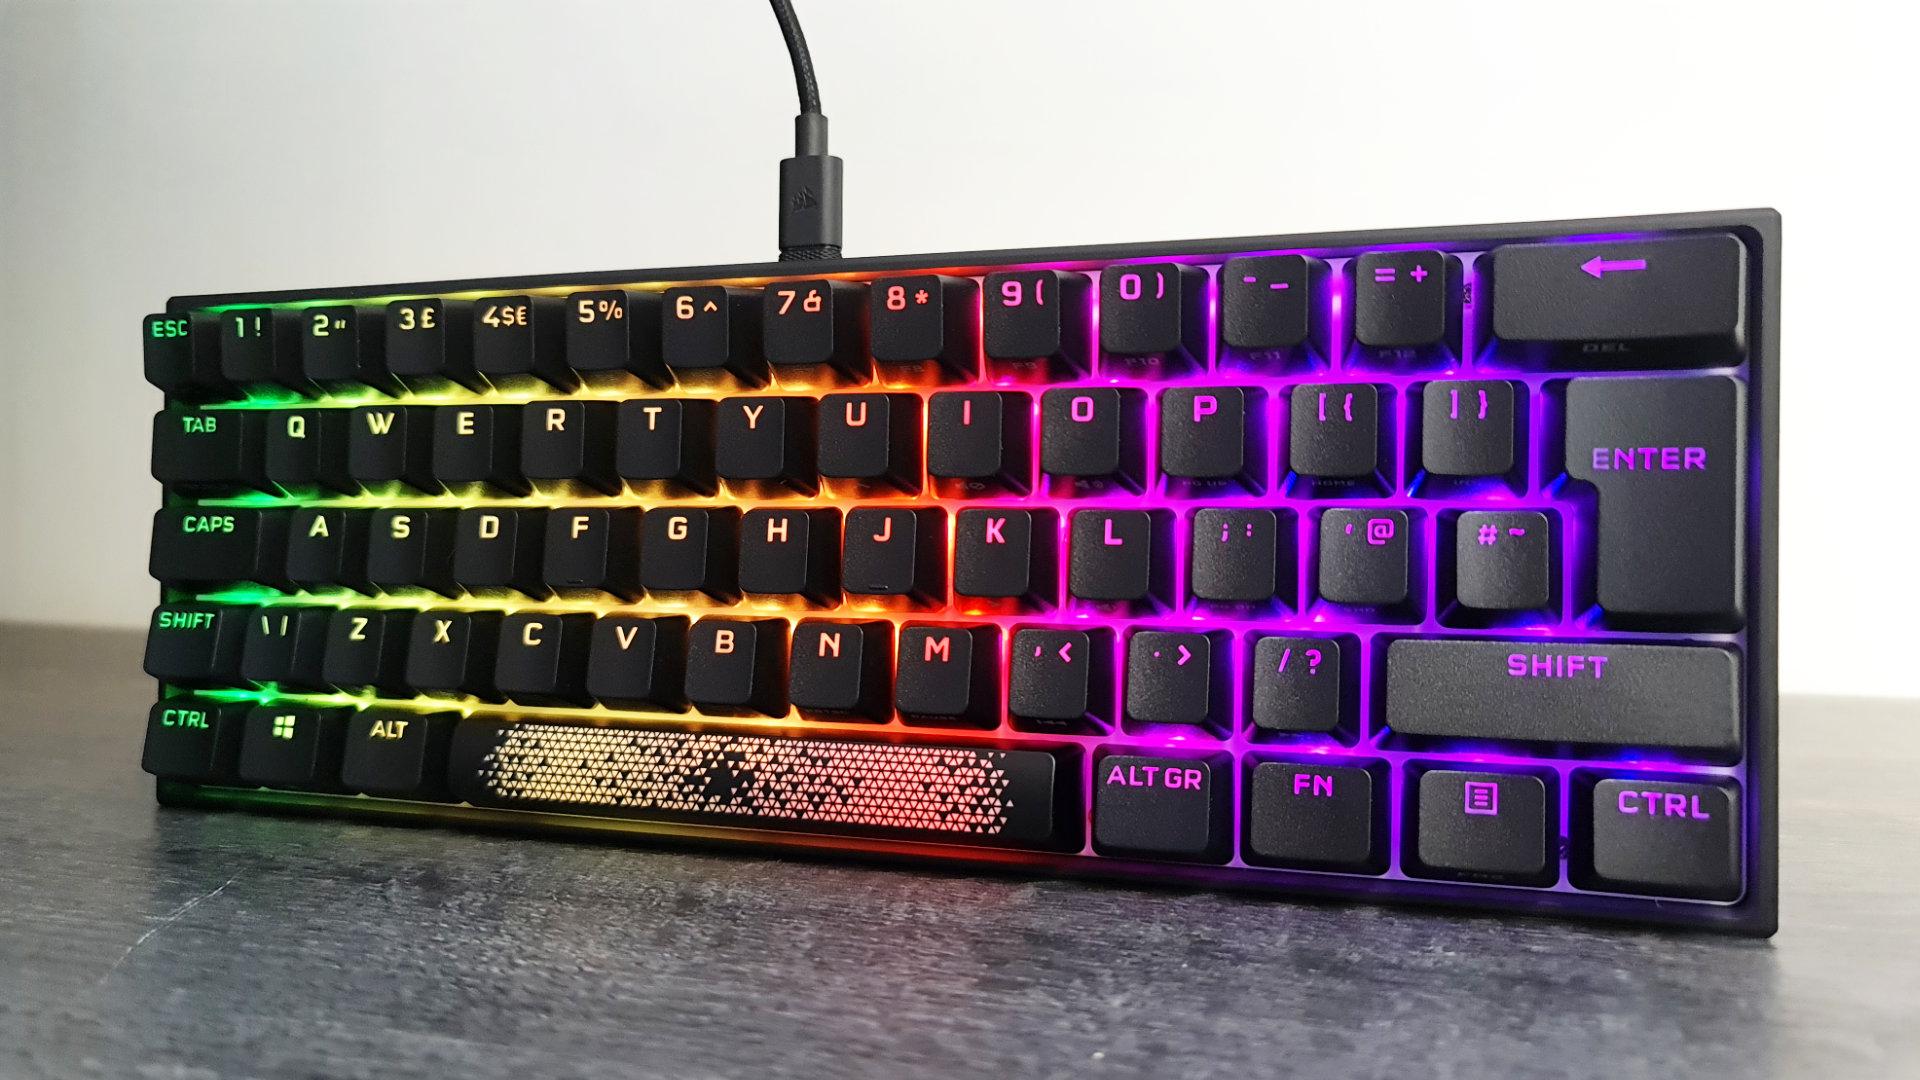 Corsair K65 RGB Mini review – a stunning 60% gaming keyboard